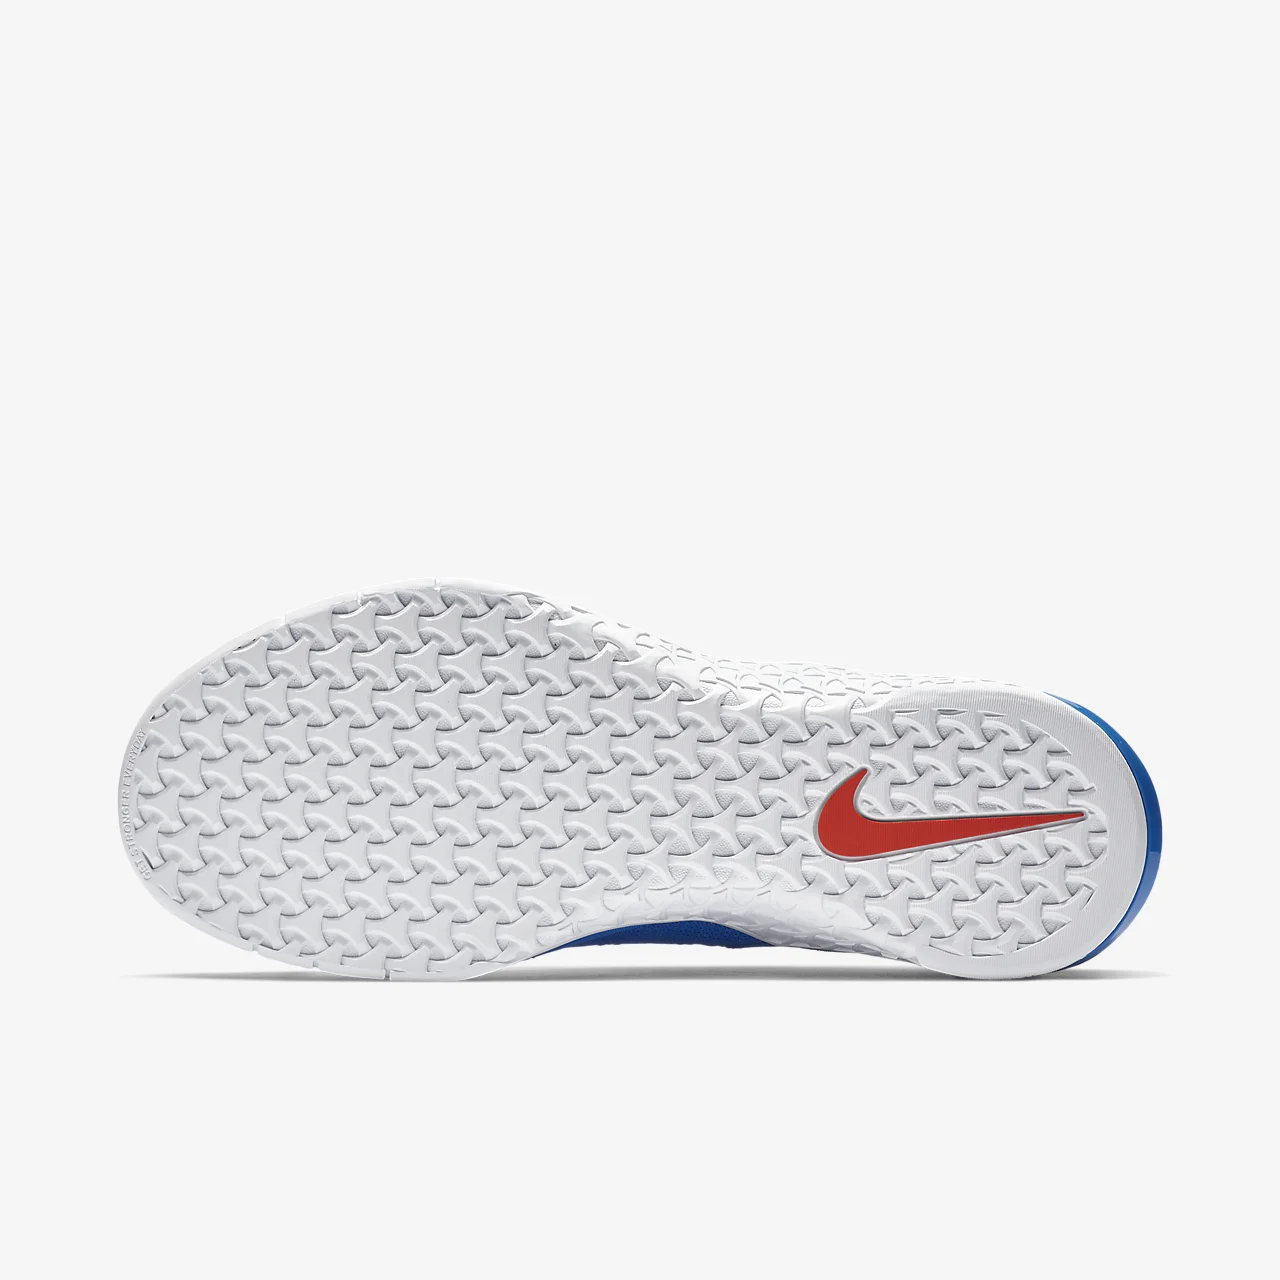 Nike Metcon Flyknit 3 Men's Cross Training/Weightlifting Shoe AQ8022-401